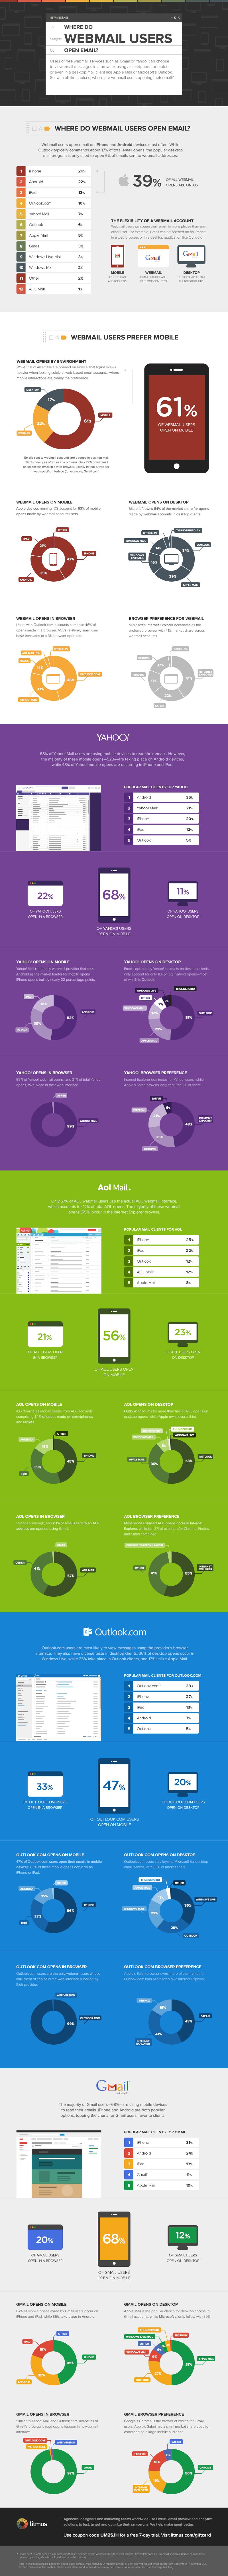 Webmail User Statistics